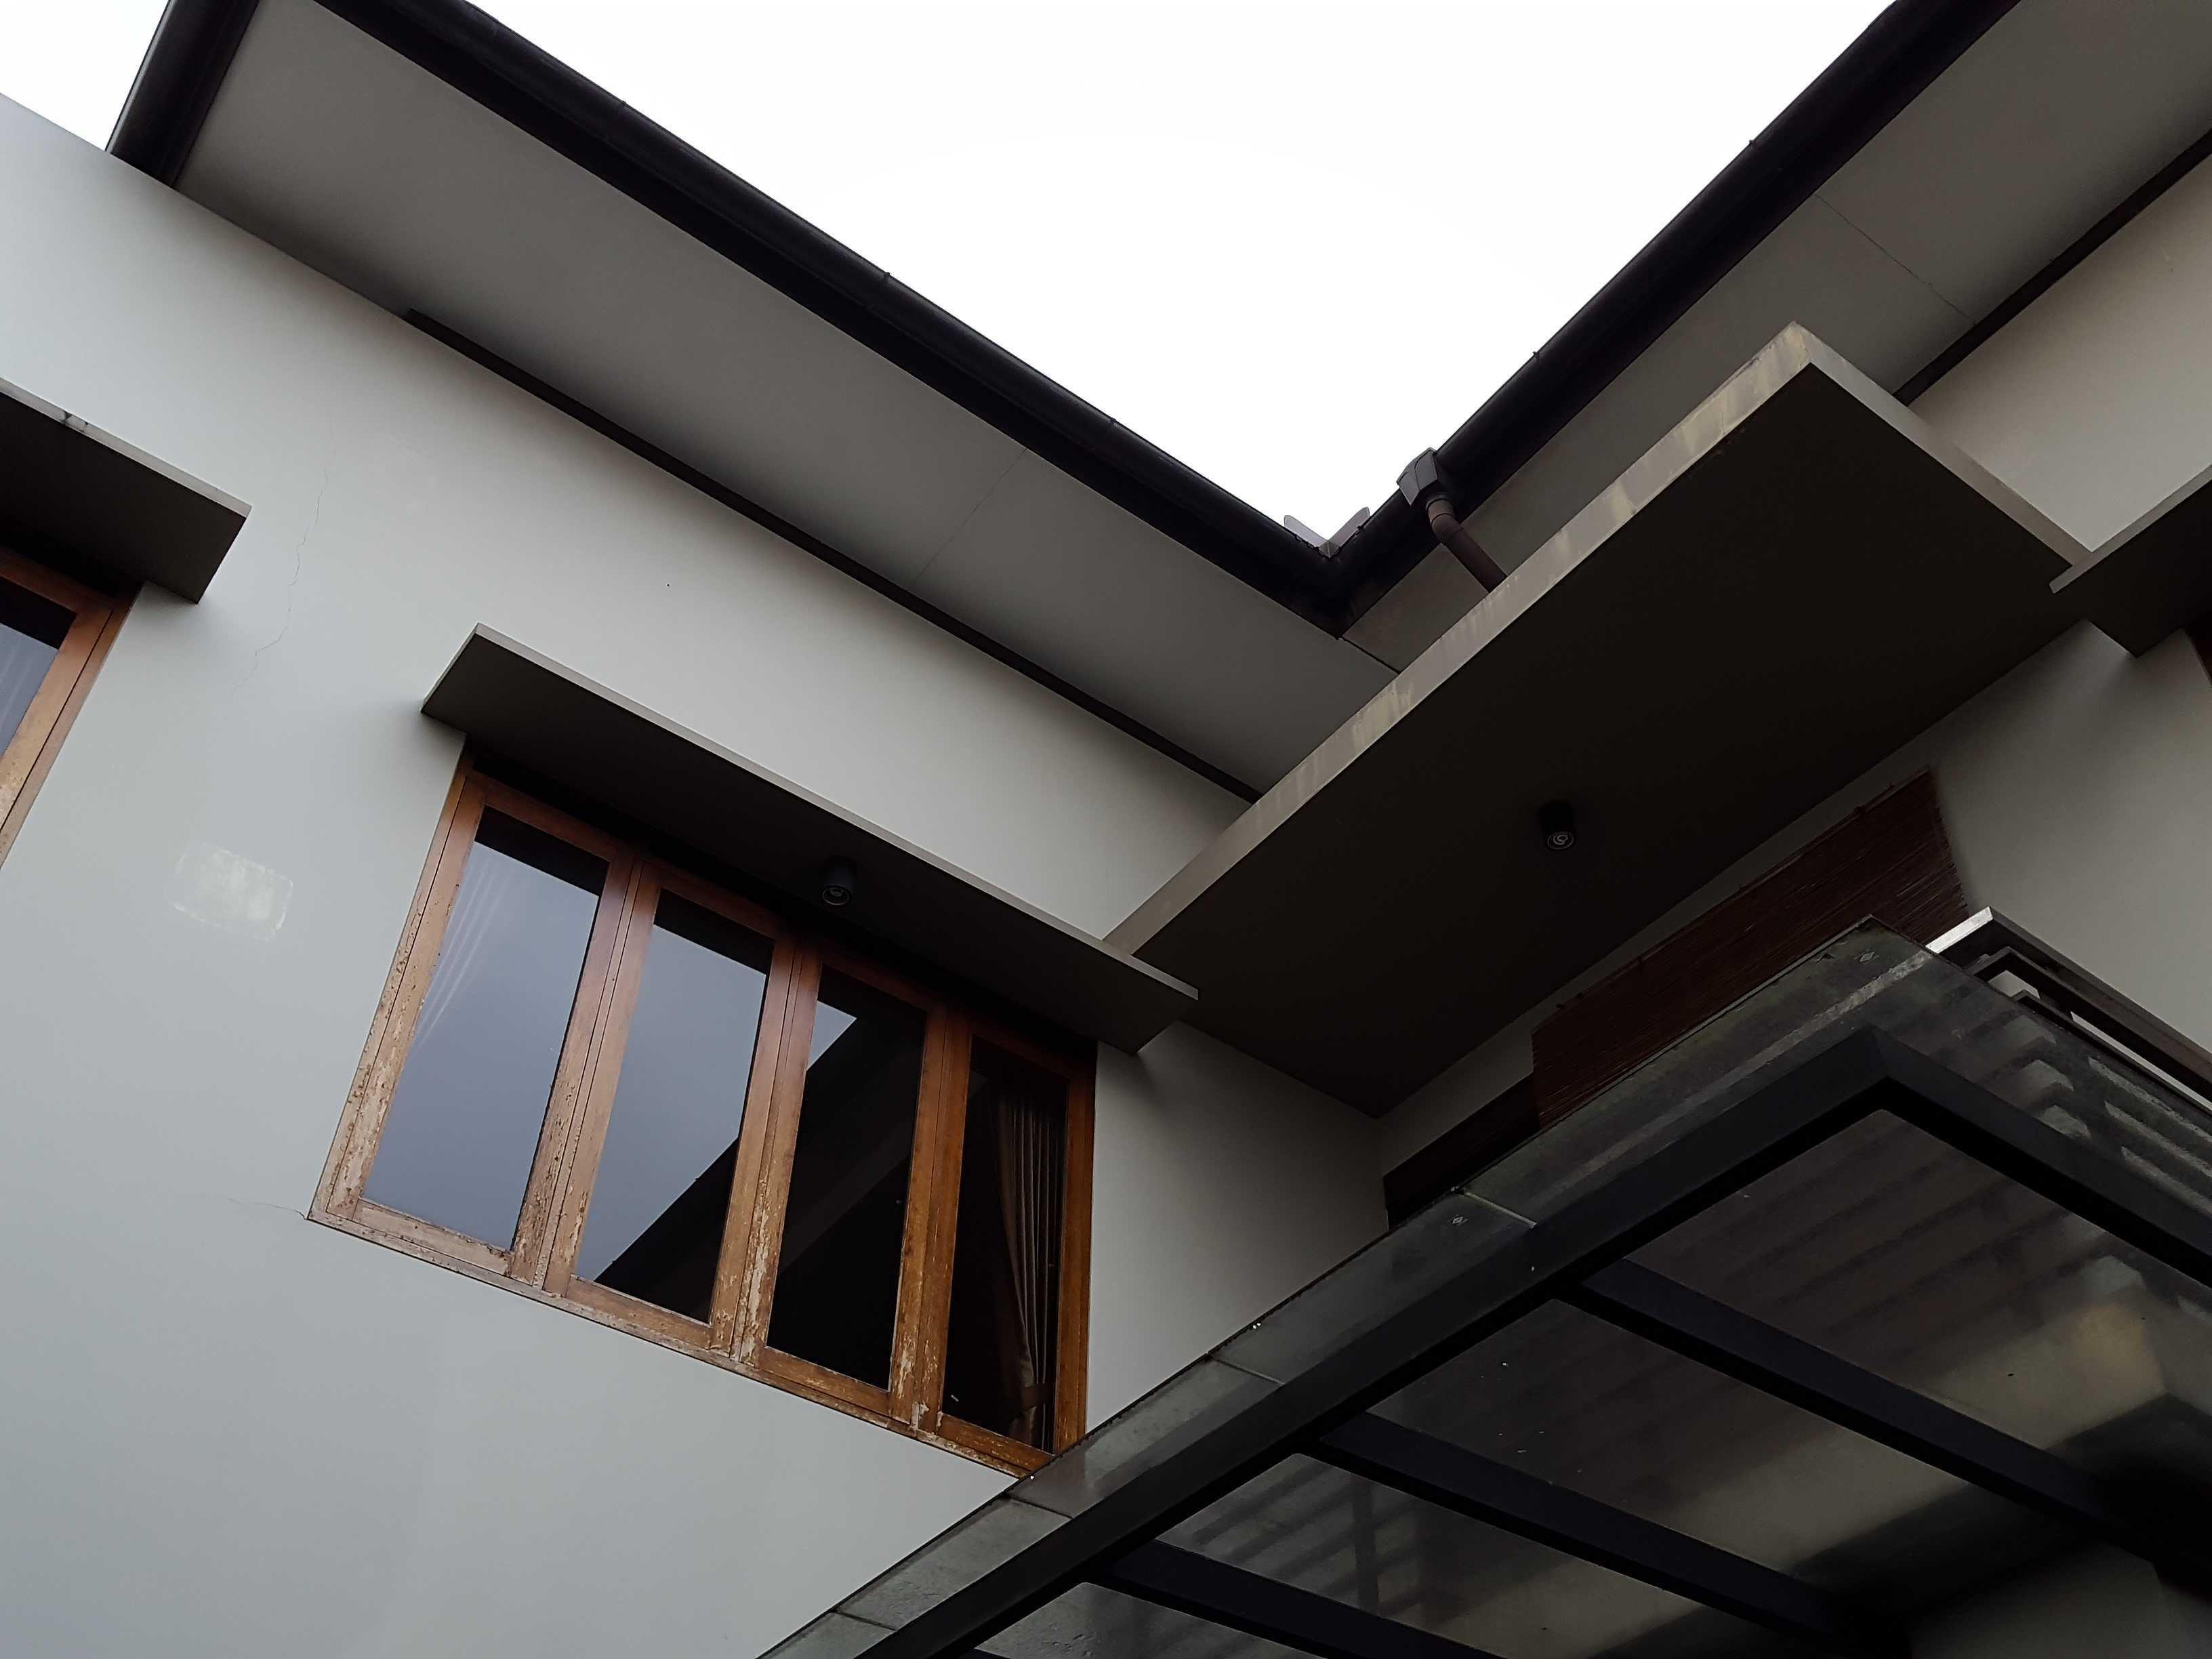 Christianto Hendrawan Rw House Bandung City, West Java, Indonesia Bandung City, West Java, Indonesia 20160526164353 Modern  35240